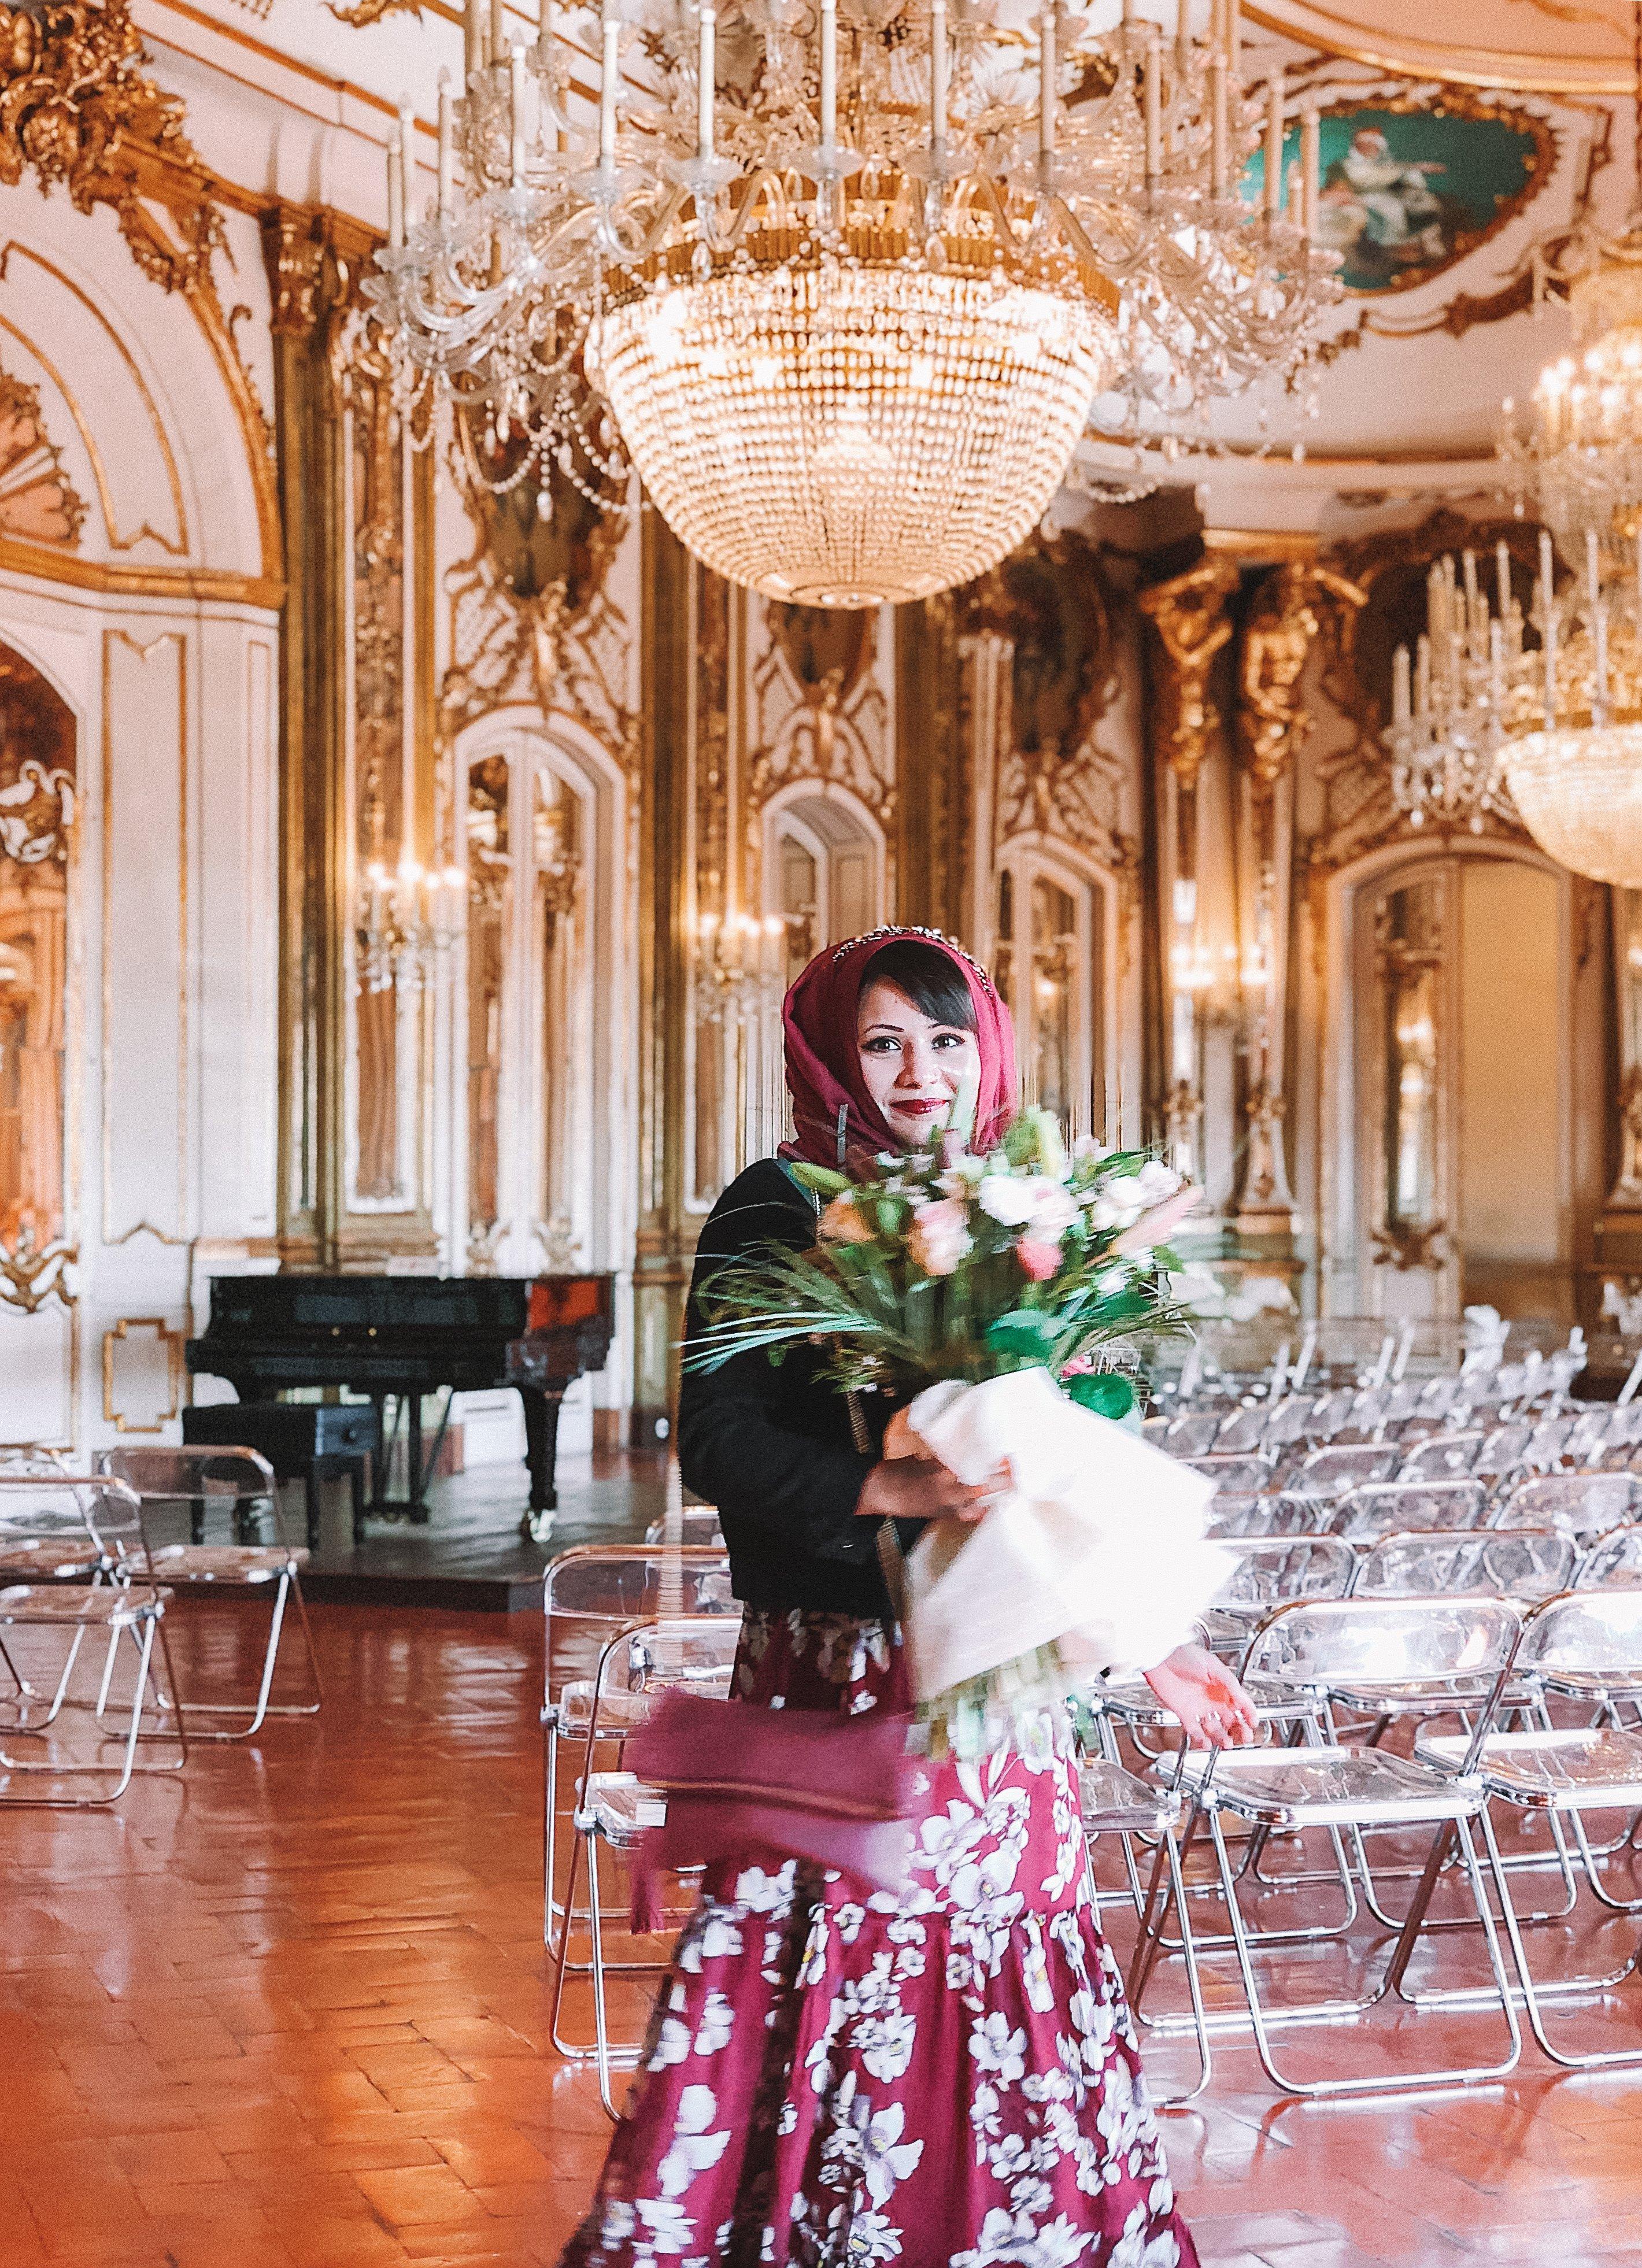 Muslim-travel-tips-Sintra-Portugal-Palace-of-Queluz-ballroom-hijabi